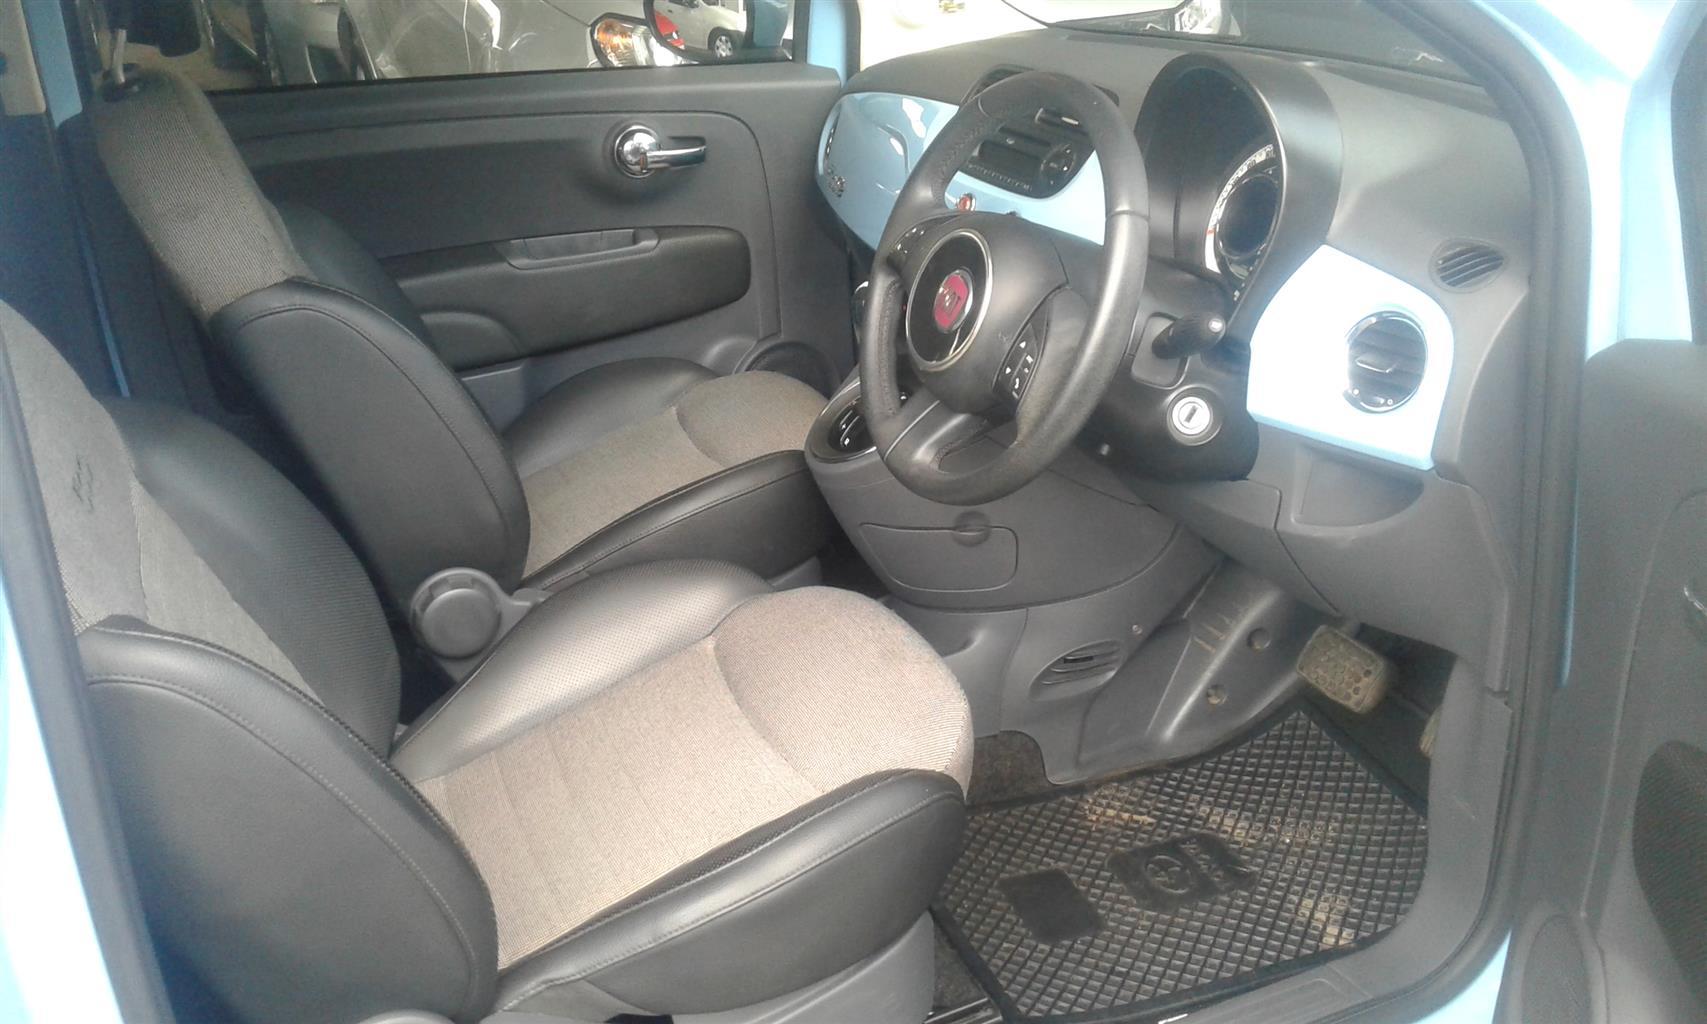 2012 Fiat 500 S cabriolet 1.4 auto